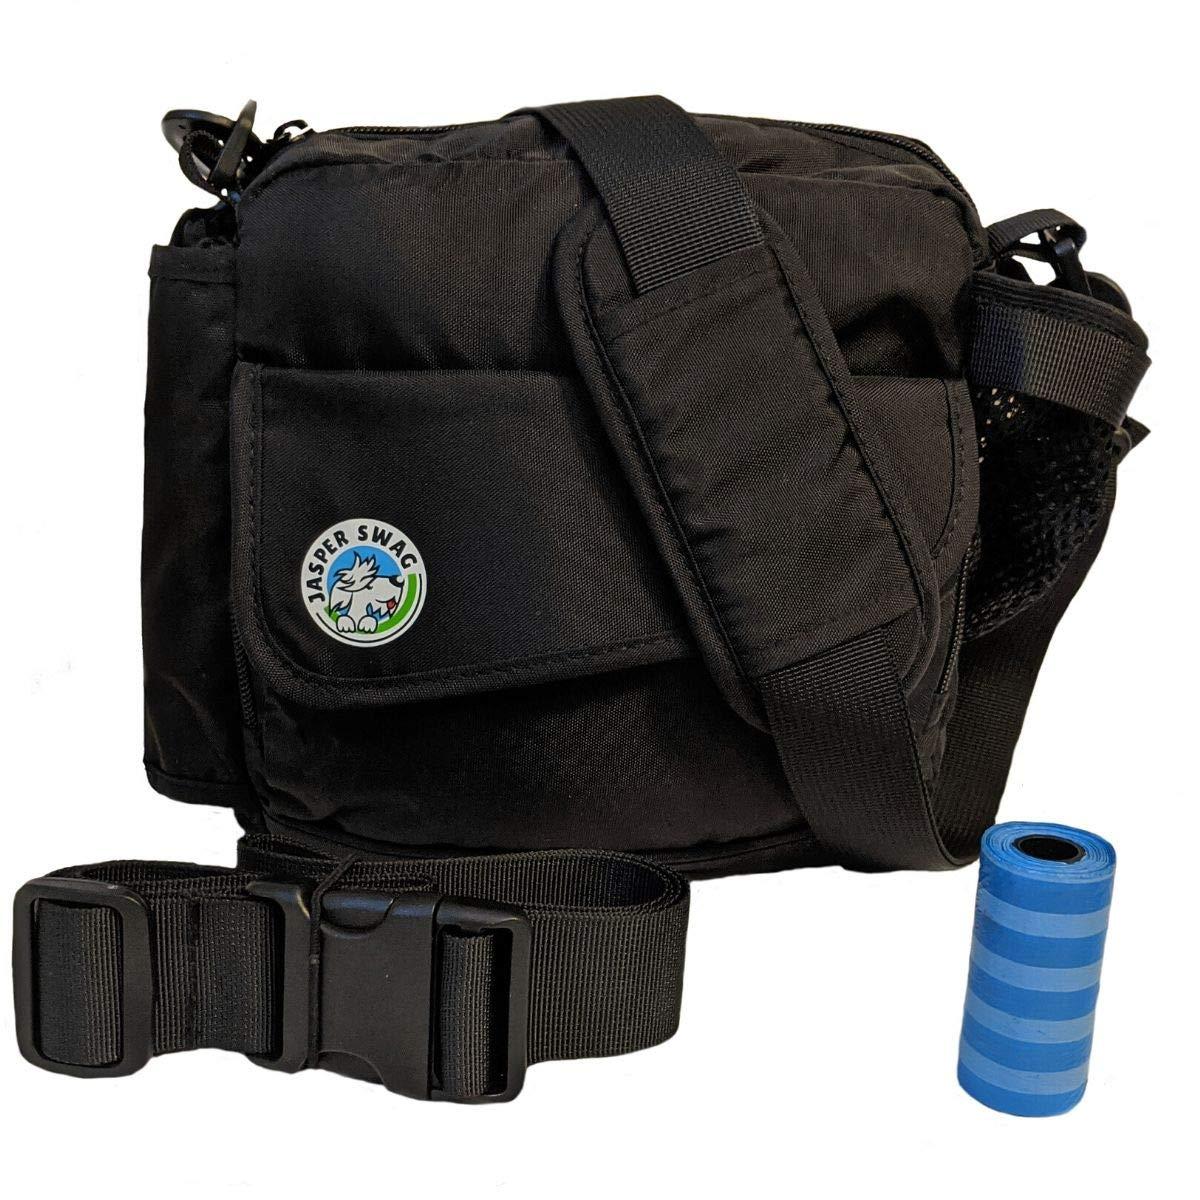 Jasper Swag Premium Dog Walking Bag, Fanny Pack Waterproof Purse with Water Bottle Holder   Dog Walking, Training, Travel, Dog Treat Pouch   Nylon Crossbody Messenger Body Bag